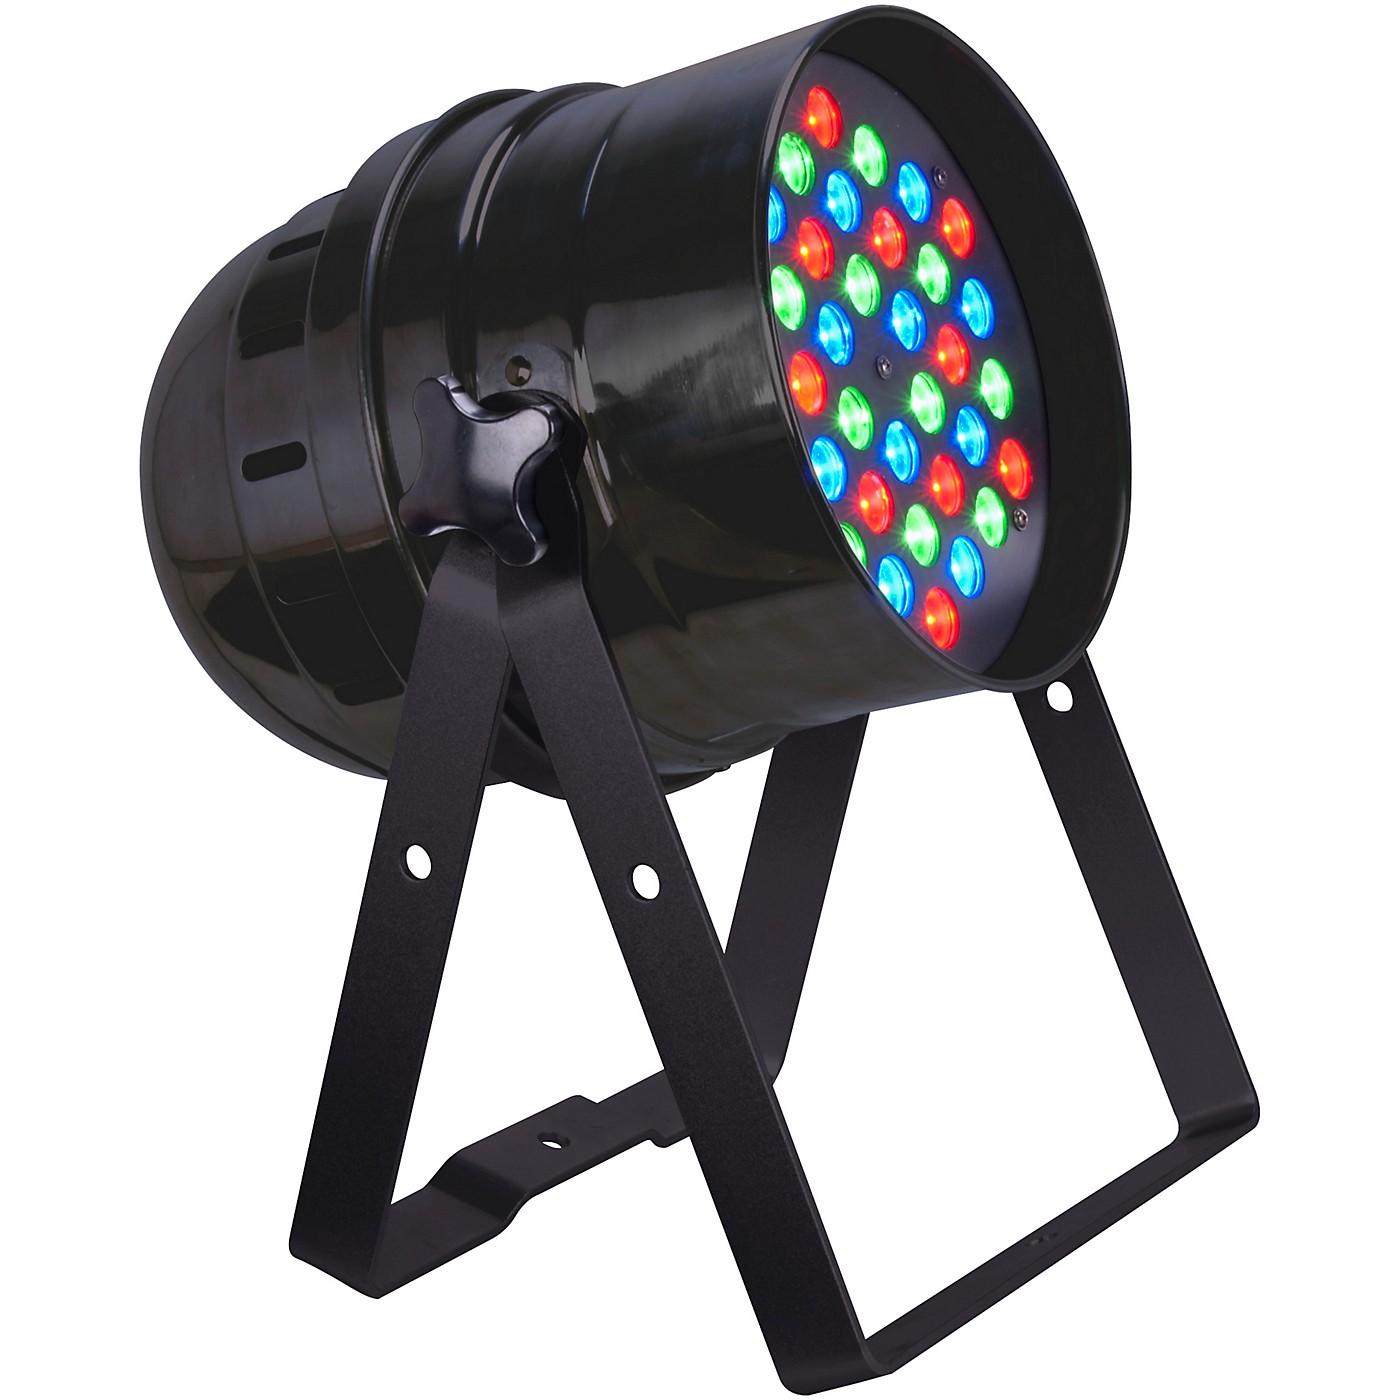 Eliminator Lighting ELECTRO 64BLED PAR RGB LED Wash Light thumbnail